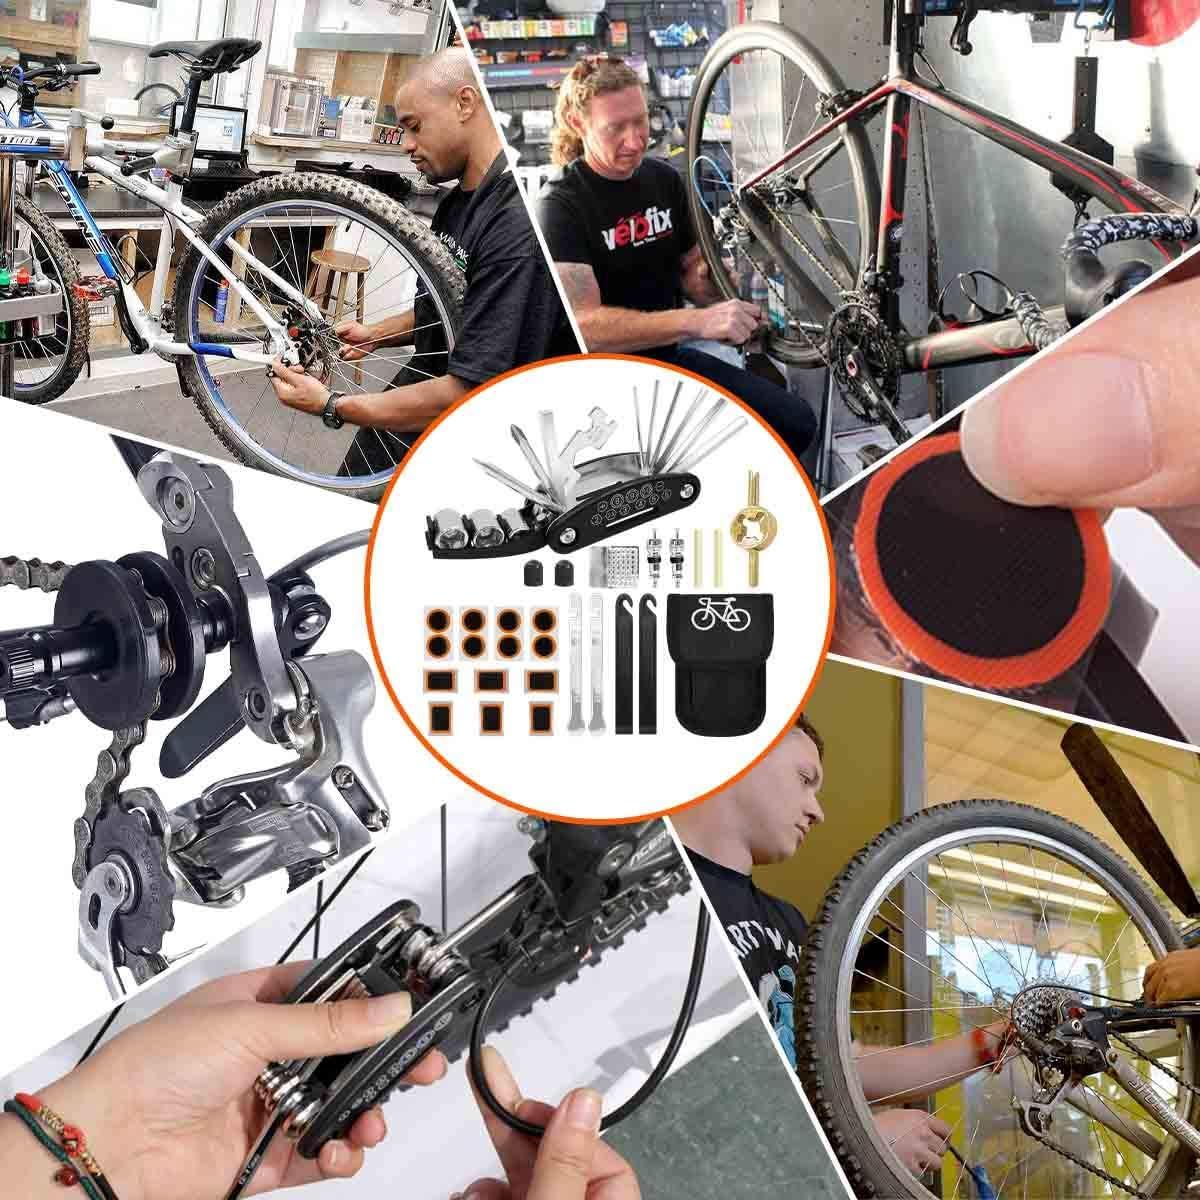 DMLNN Bike Tool Kit Bike Multi Tool Mountain Bike Accessories 16 in 1 Bike Multifunction Tool with Patch Kit /& Tire Levers Puncture Repair Kit